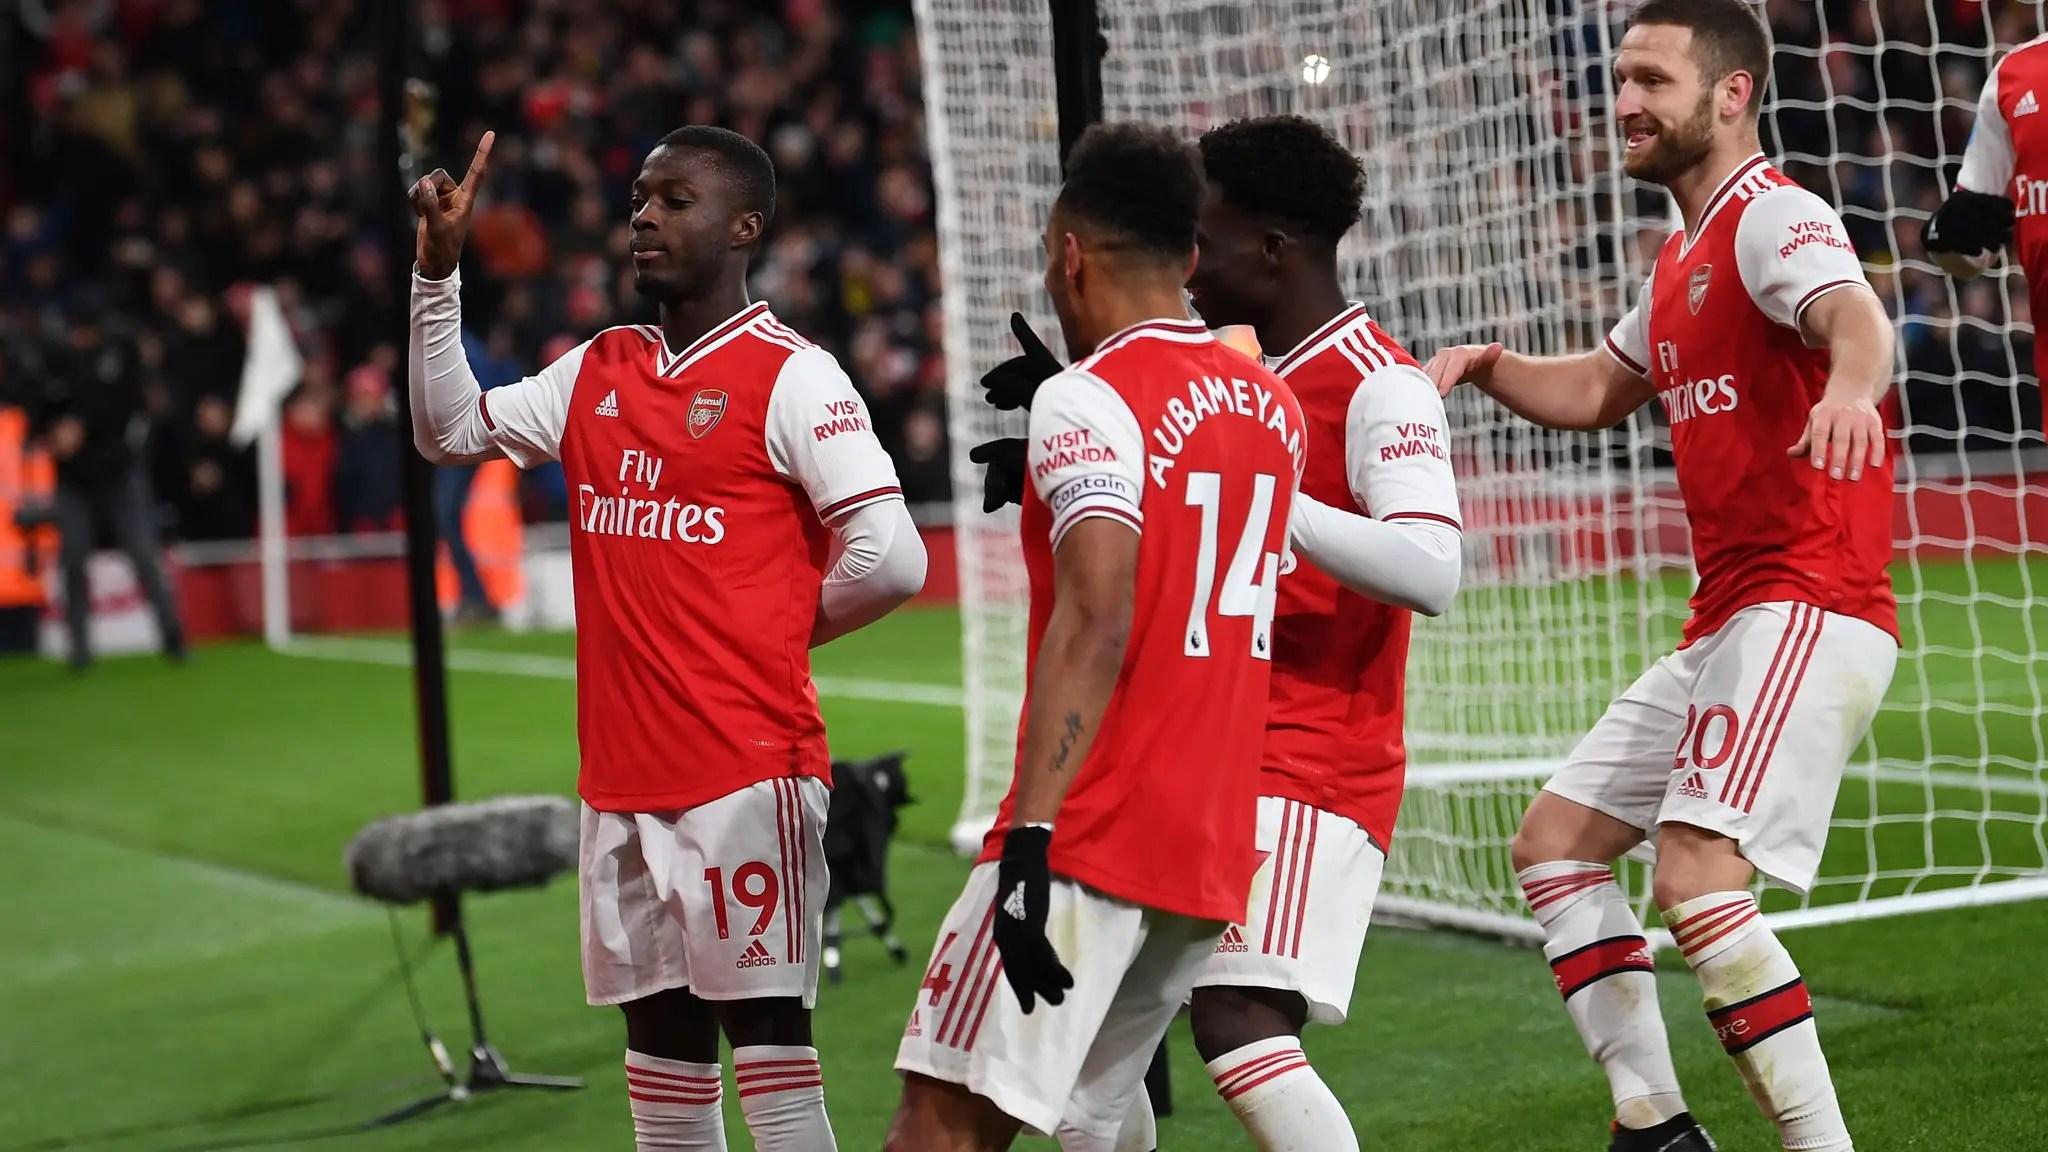 Saka Bags Assist As Arsenal Thrash Newcastle To End Premier League Winless Run